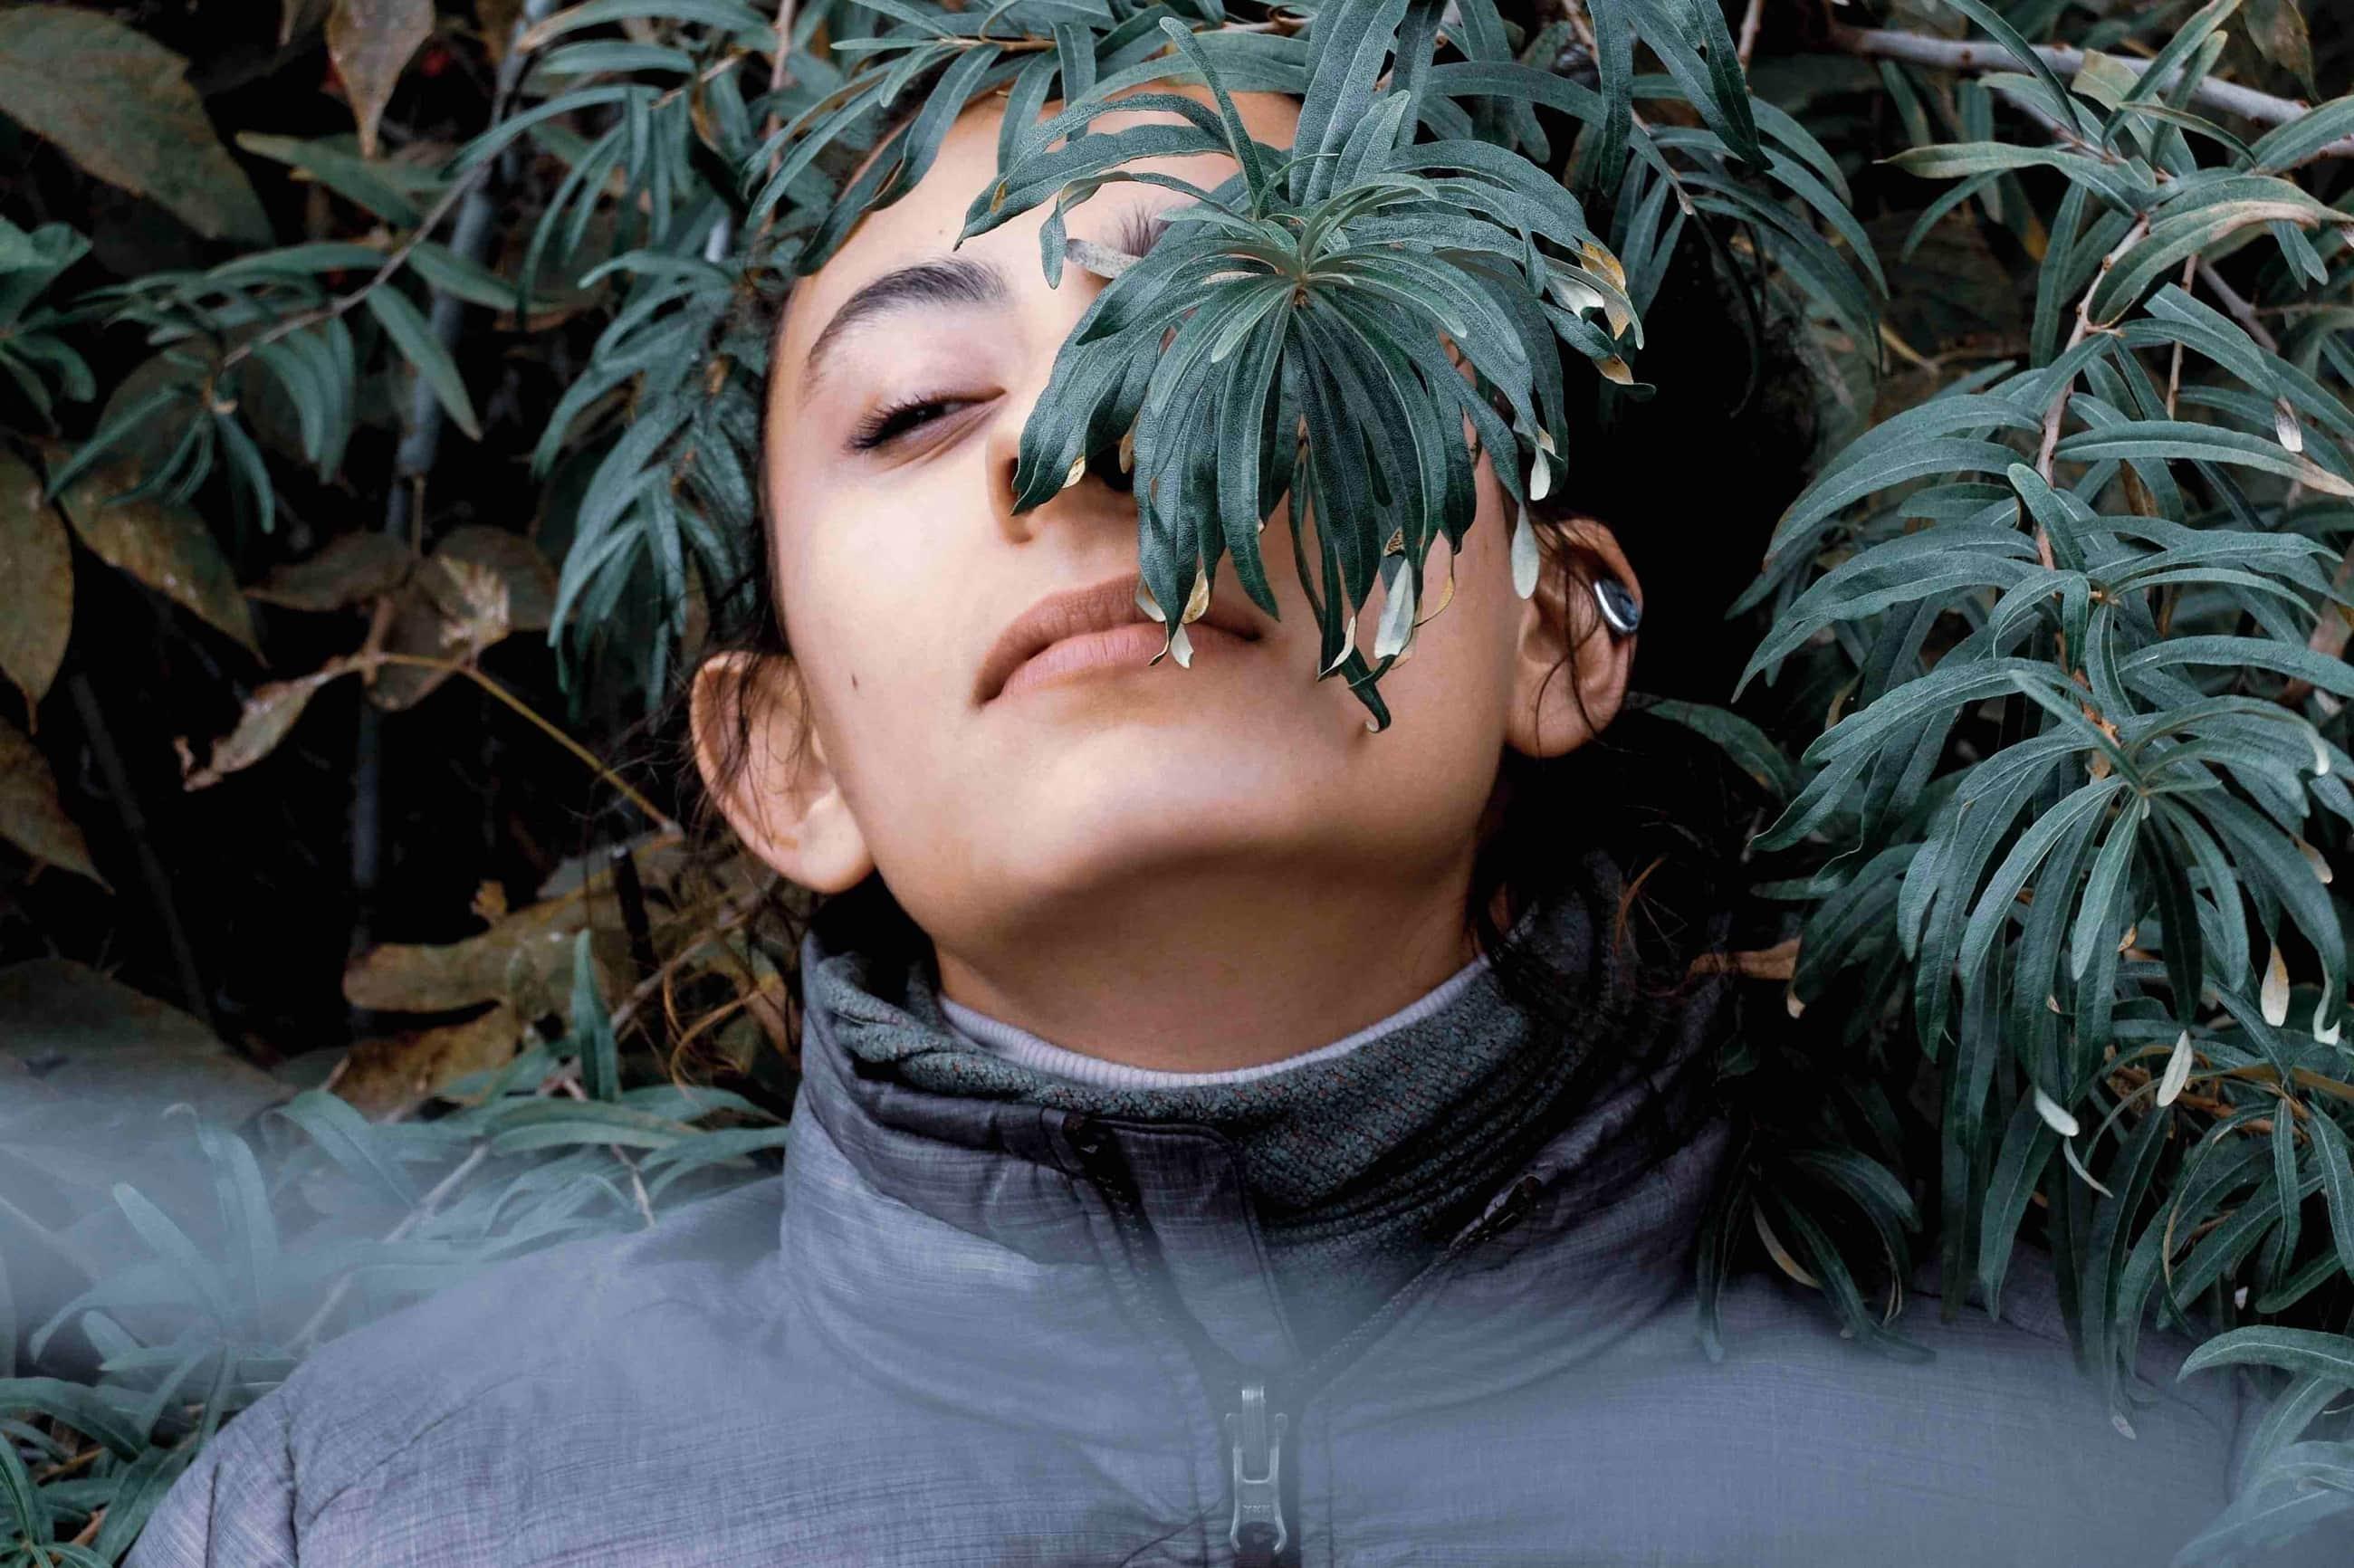 Woman sitting in plants.